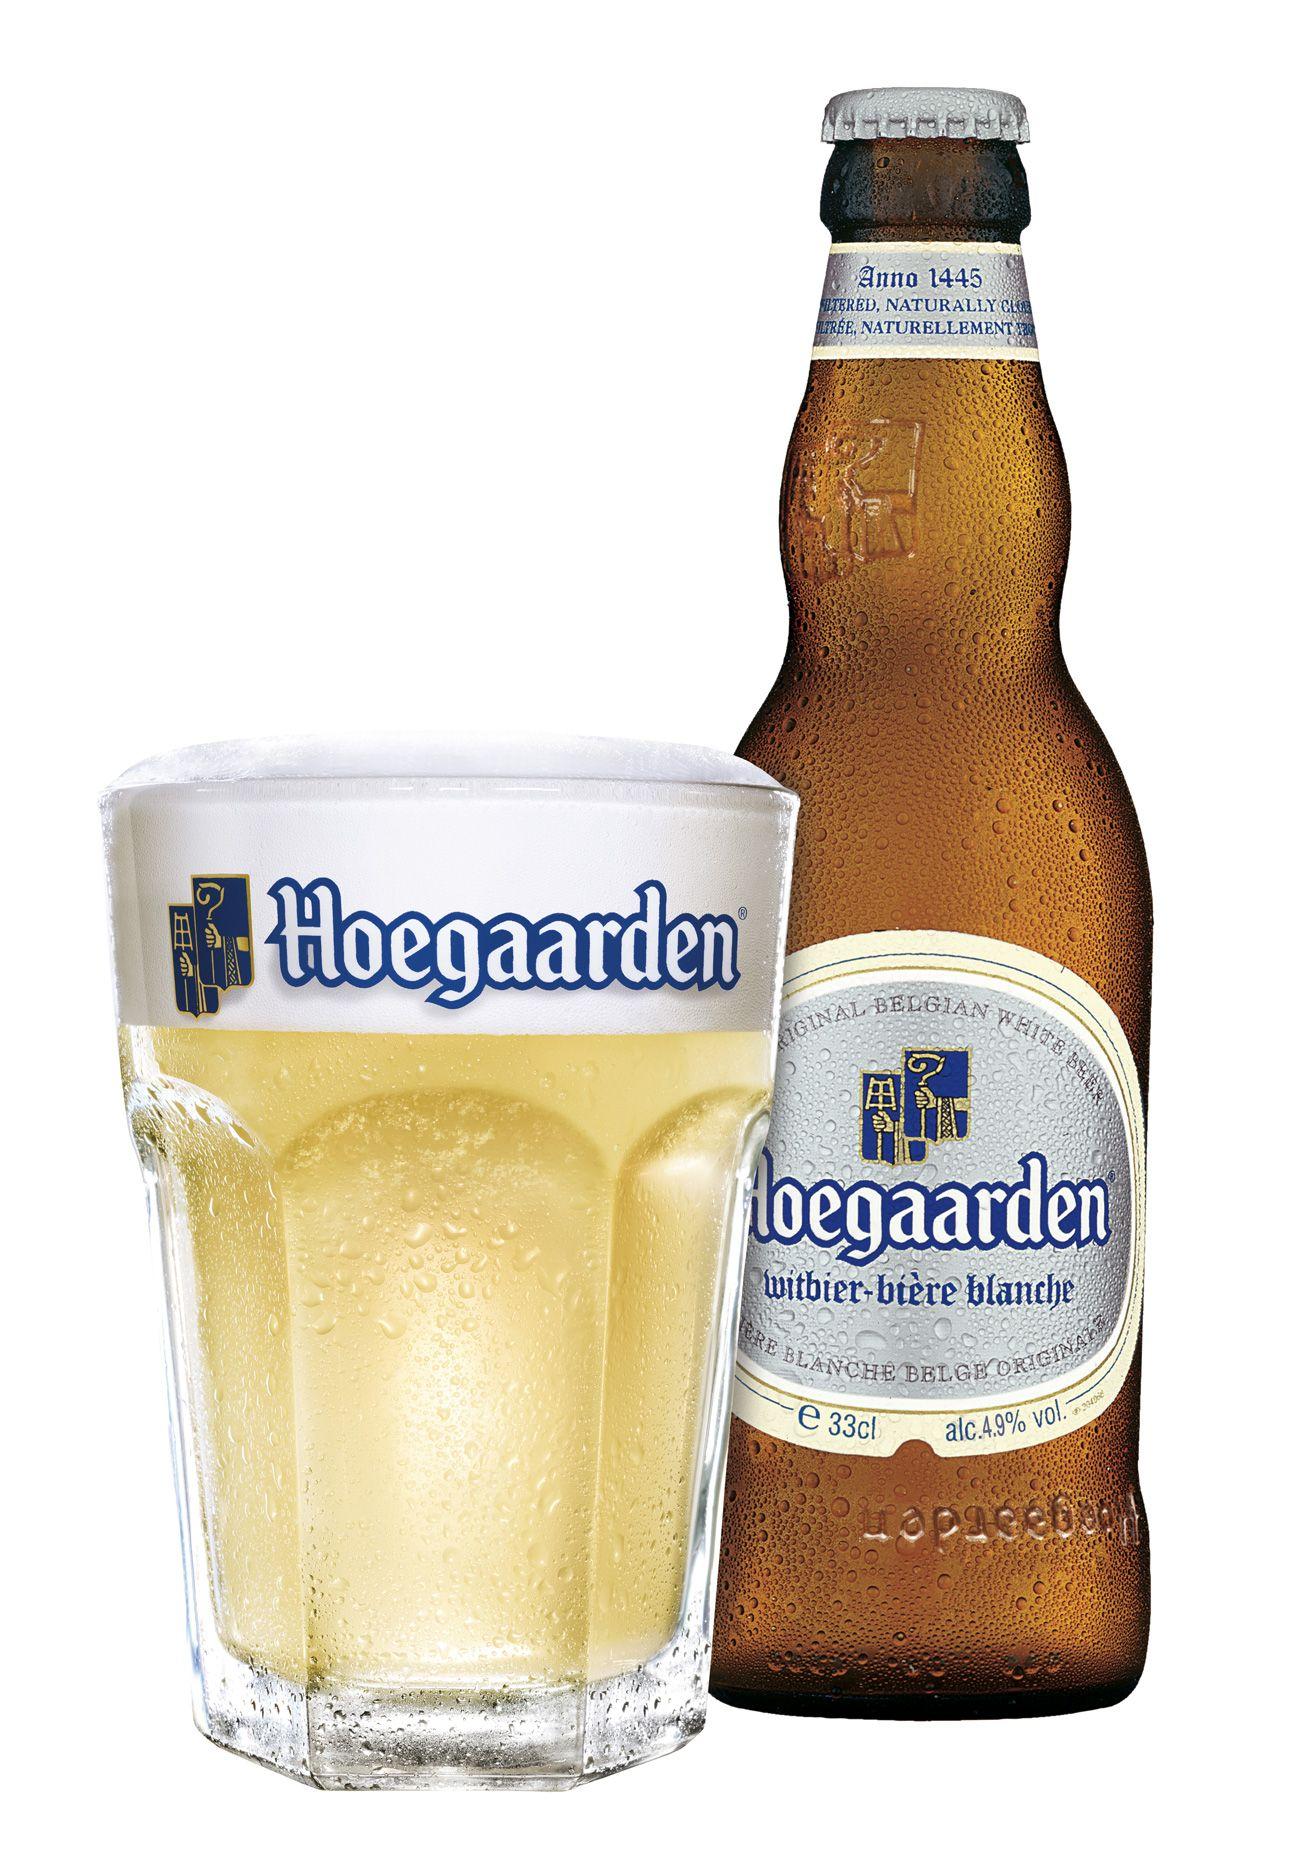 hoegaarden white ale beer